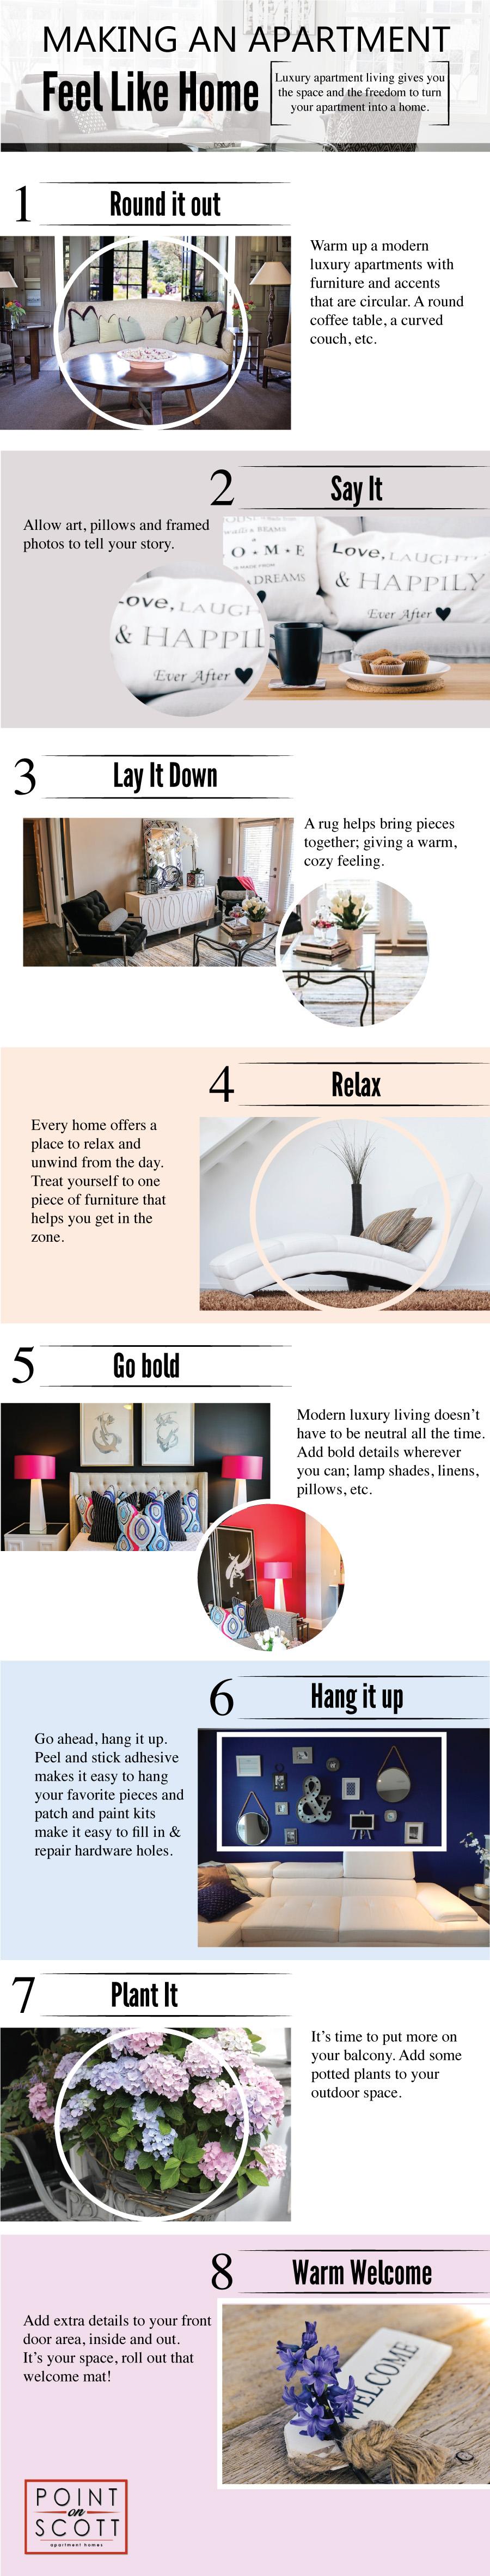 8 Tips for Make an Apartment Feel Like Home